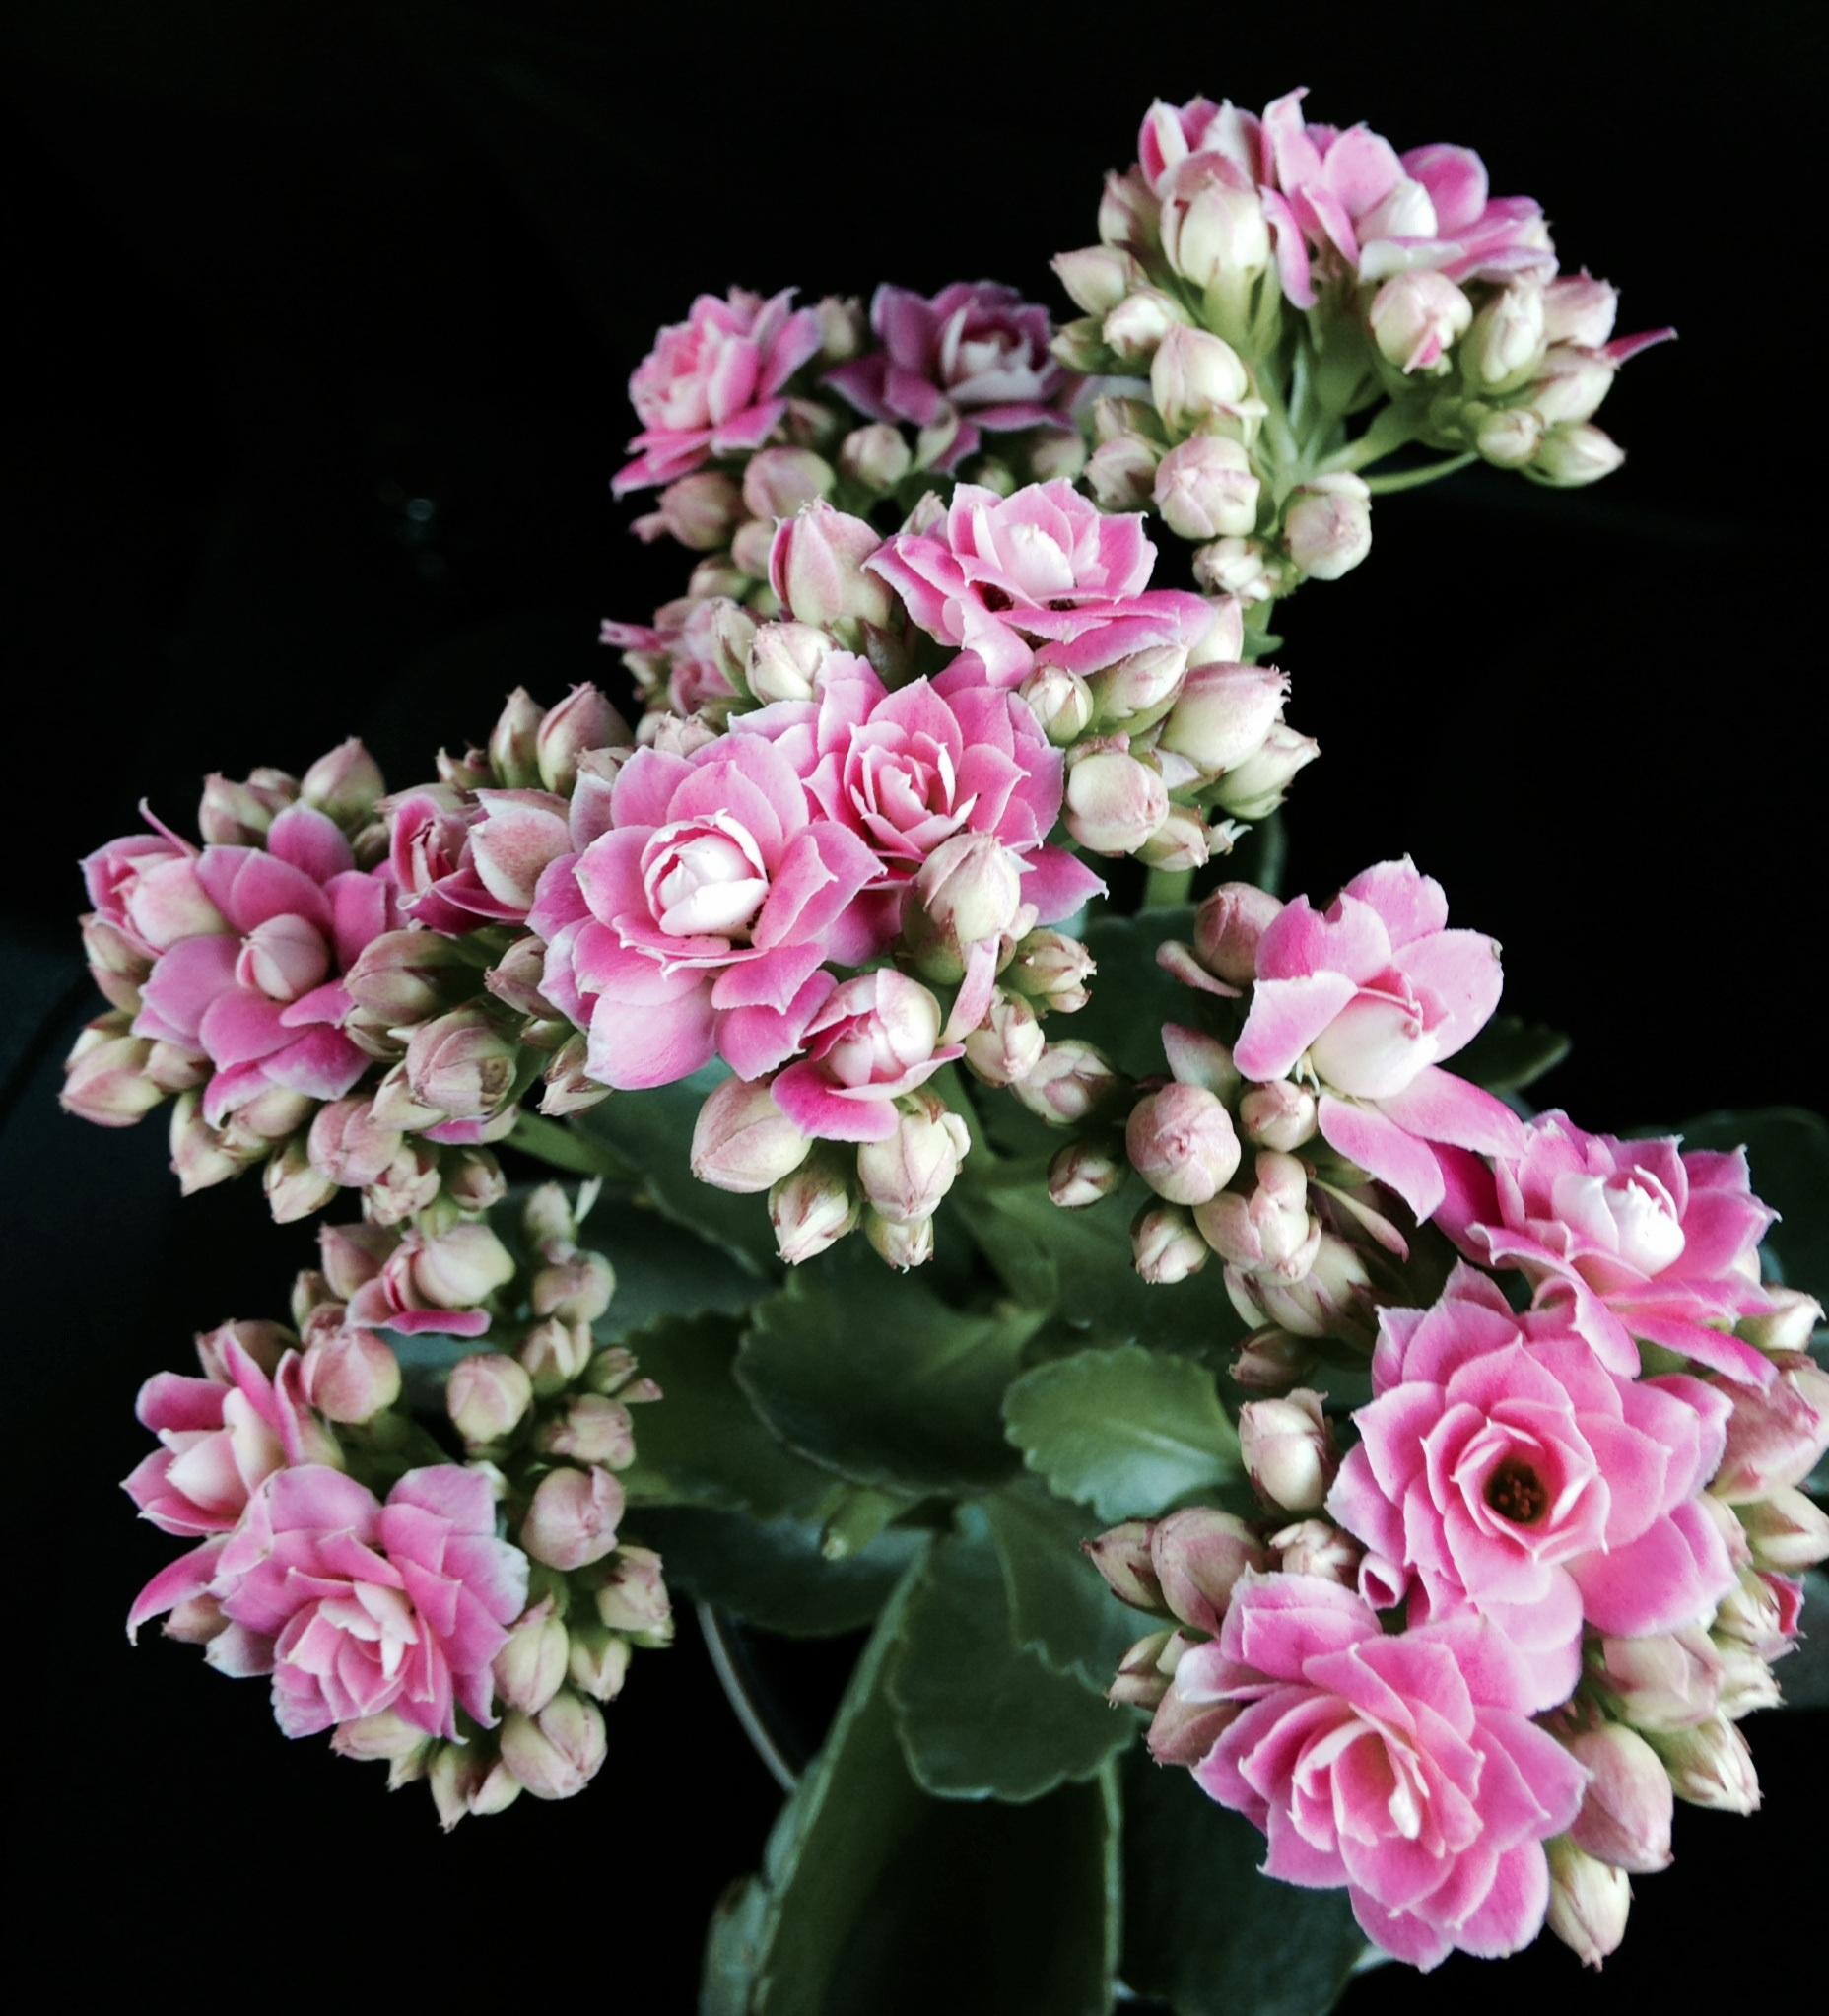 Gambar Alam Mekar Menanam Daun Bunga Musim Semi Warna